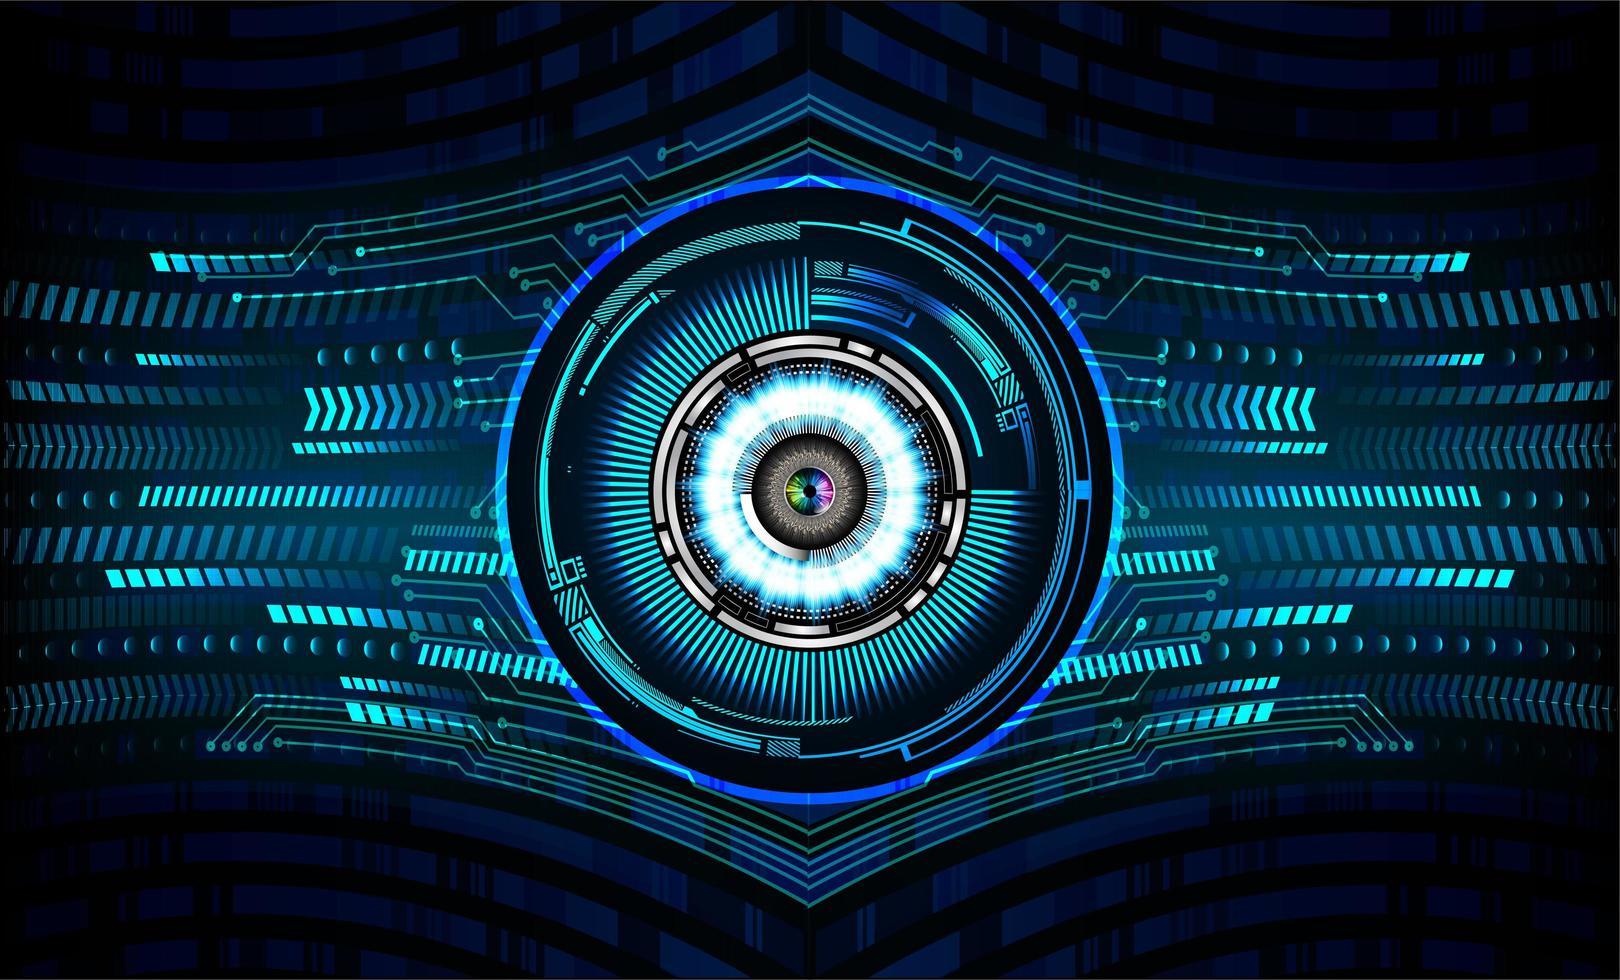 concepto de tecnología futura del circuito cibernético de ojo azul vector